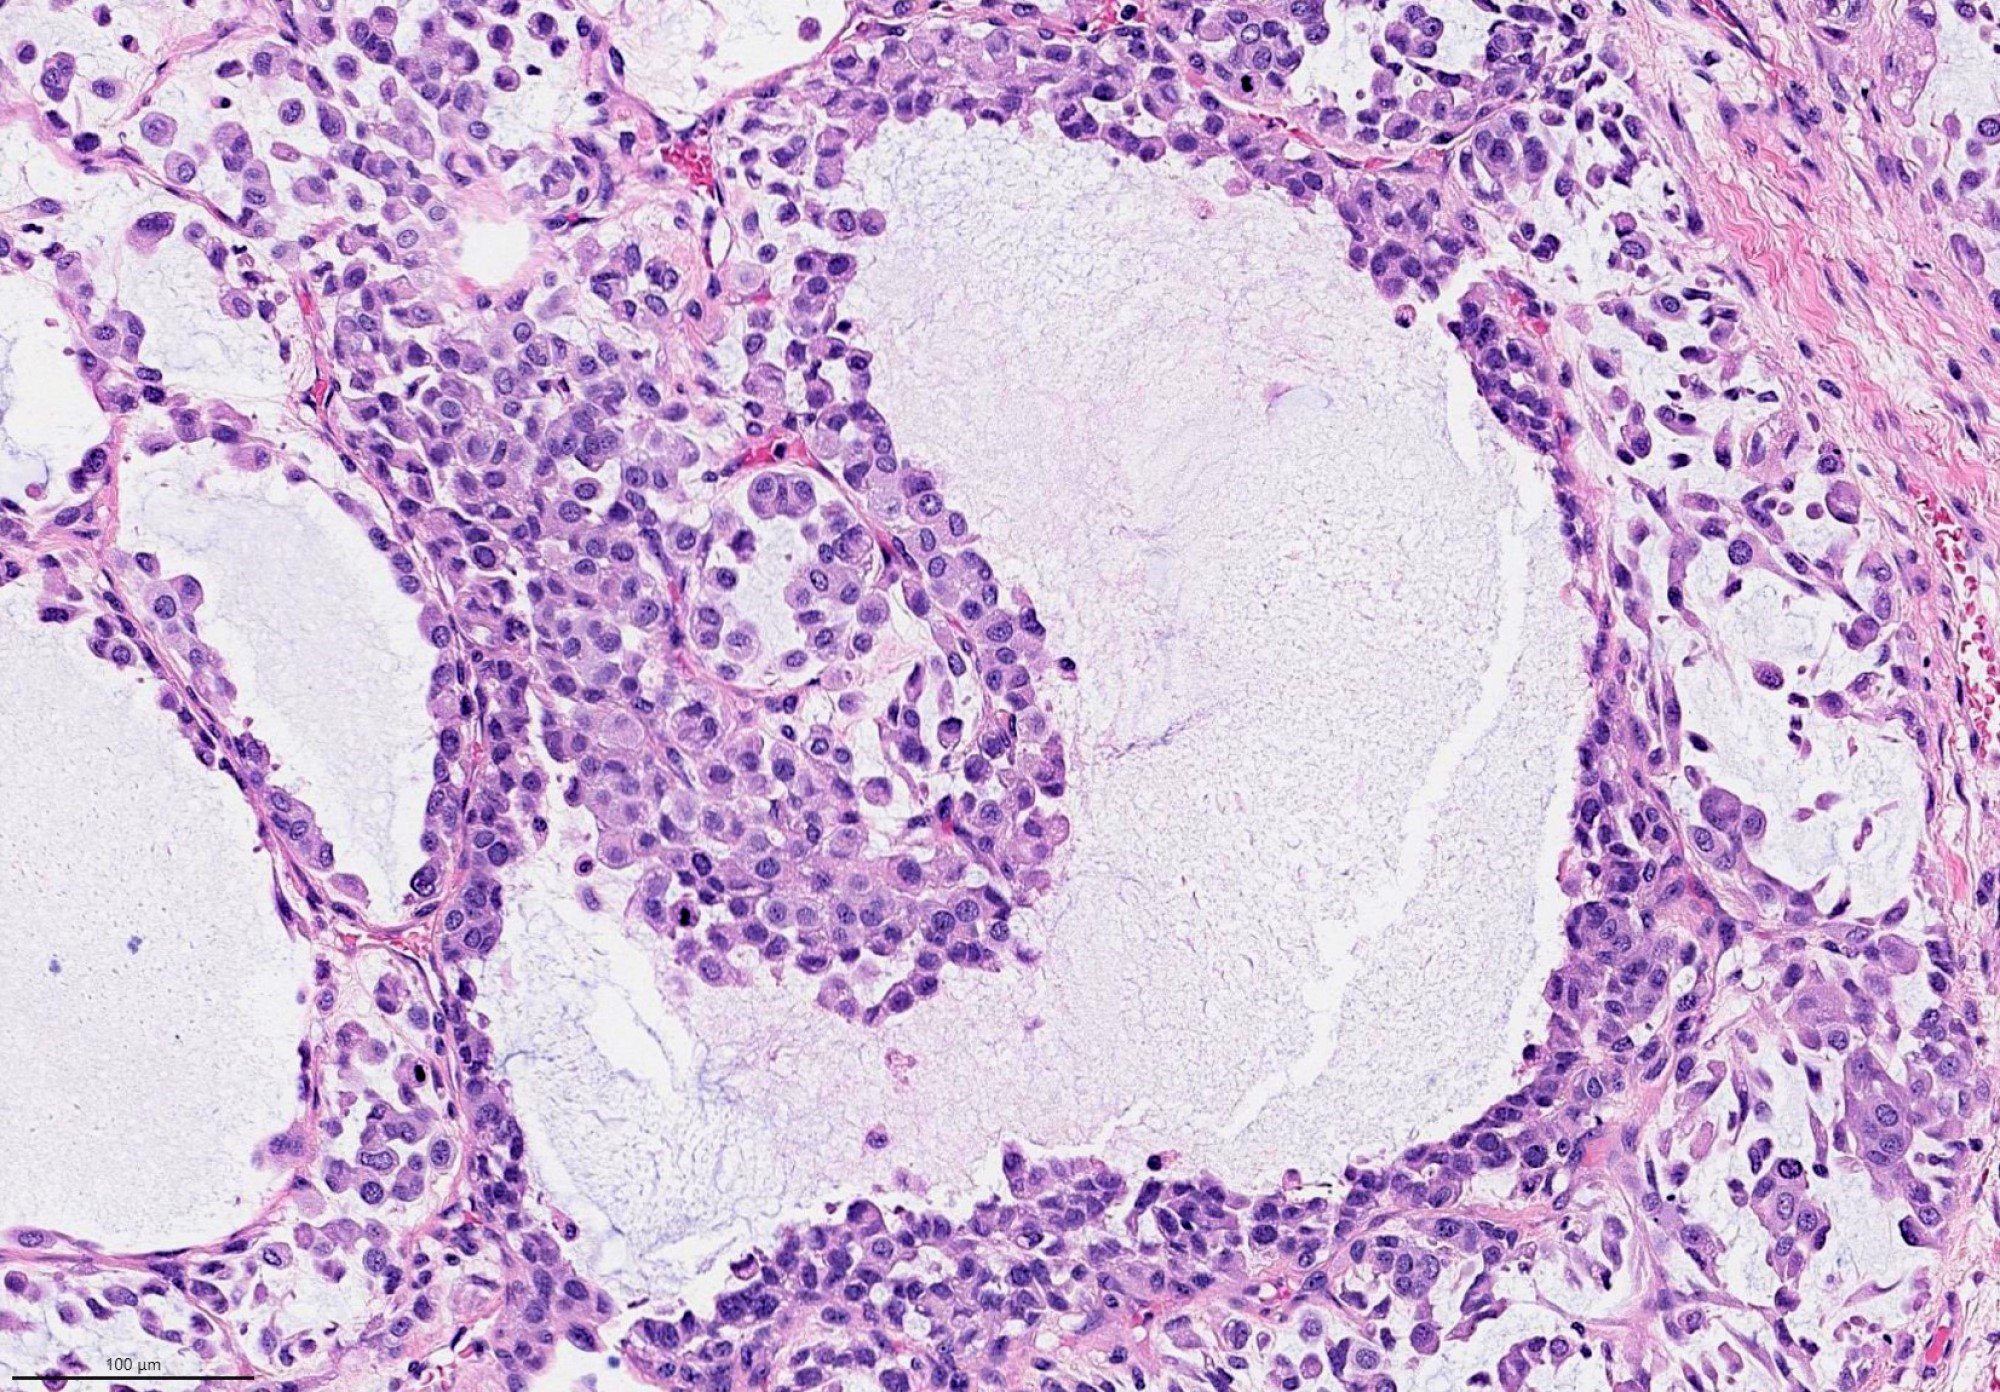 Plasmacytoid features